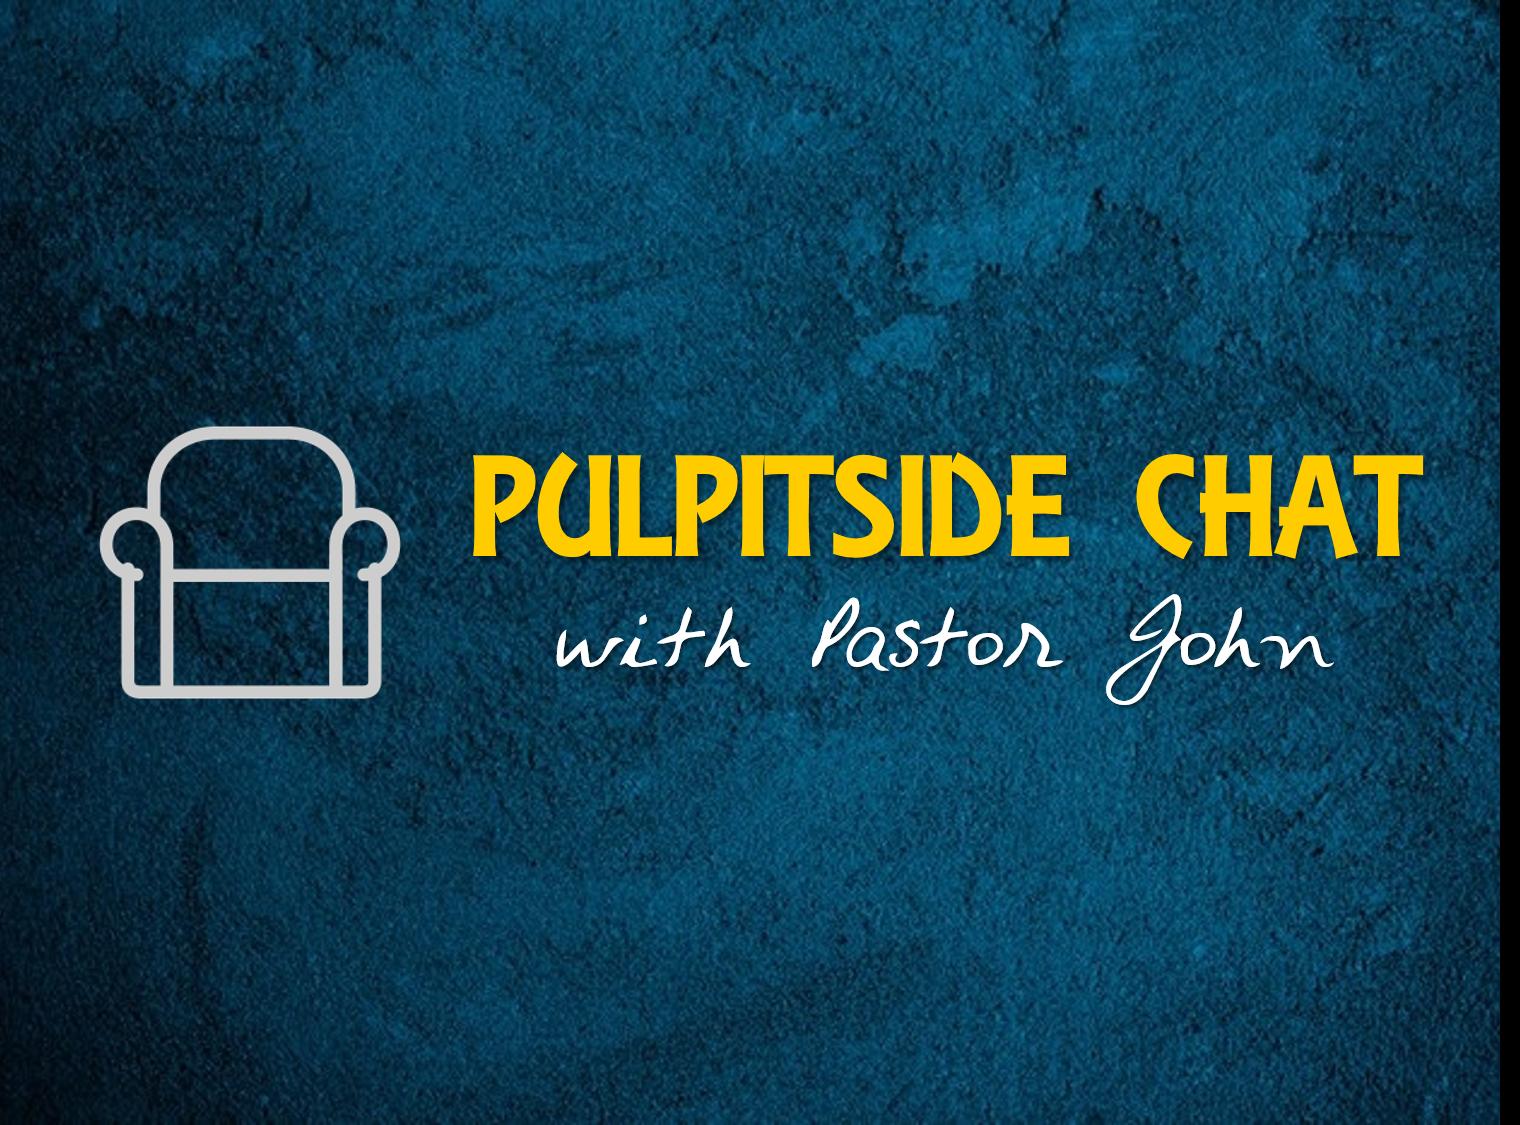 Pulpit-Side Chat